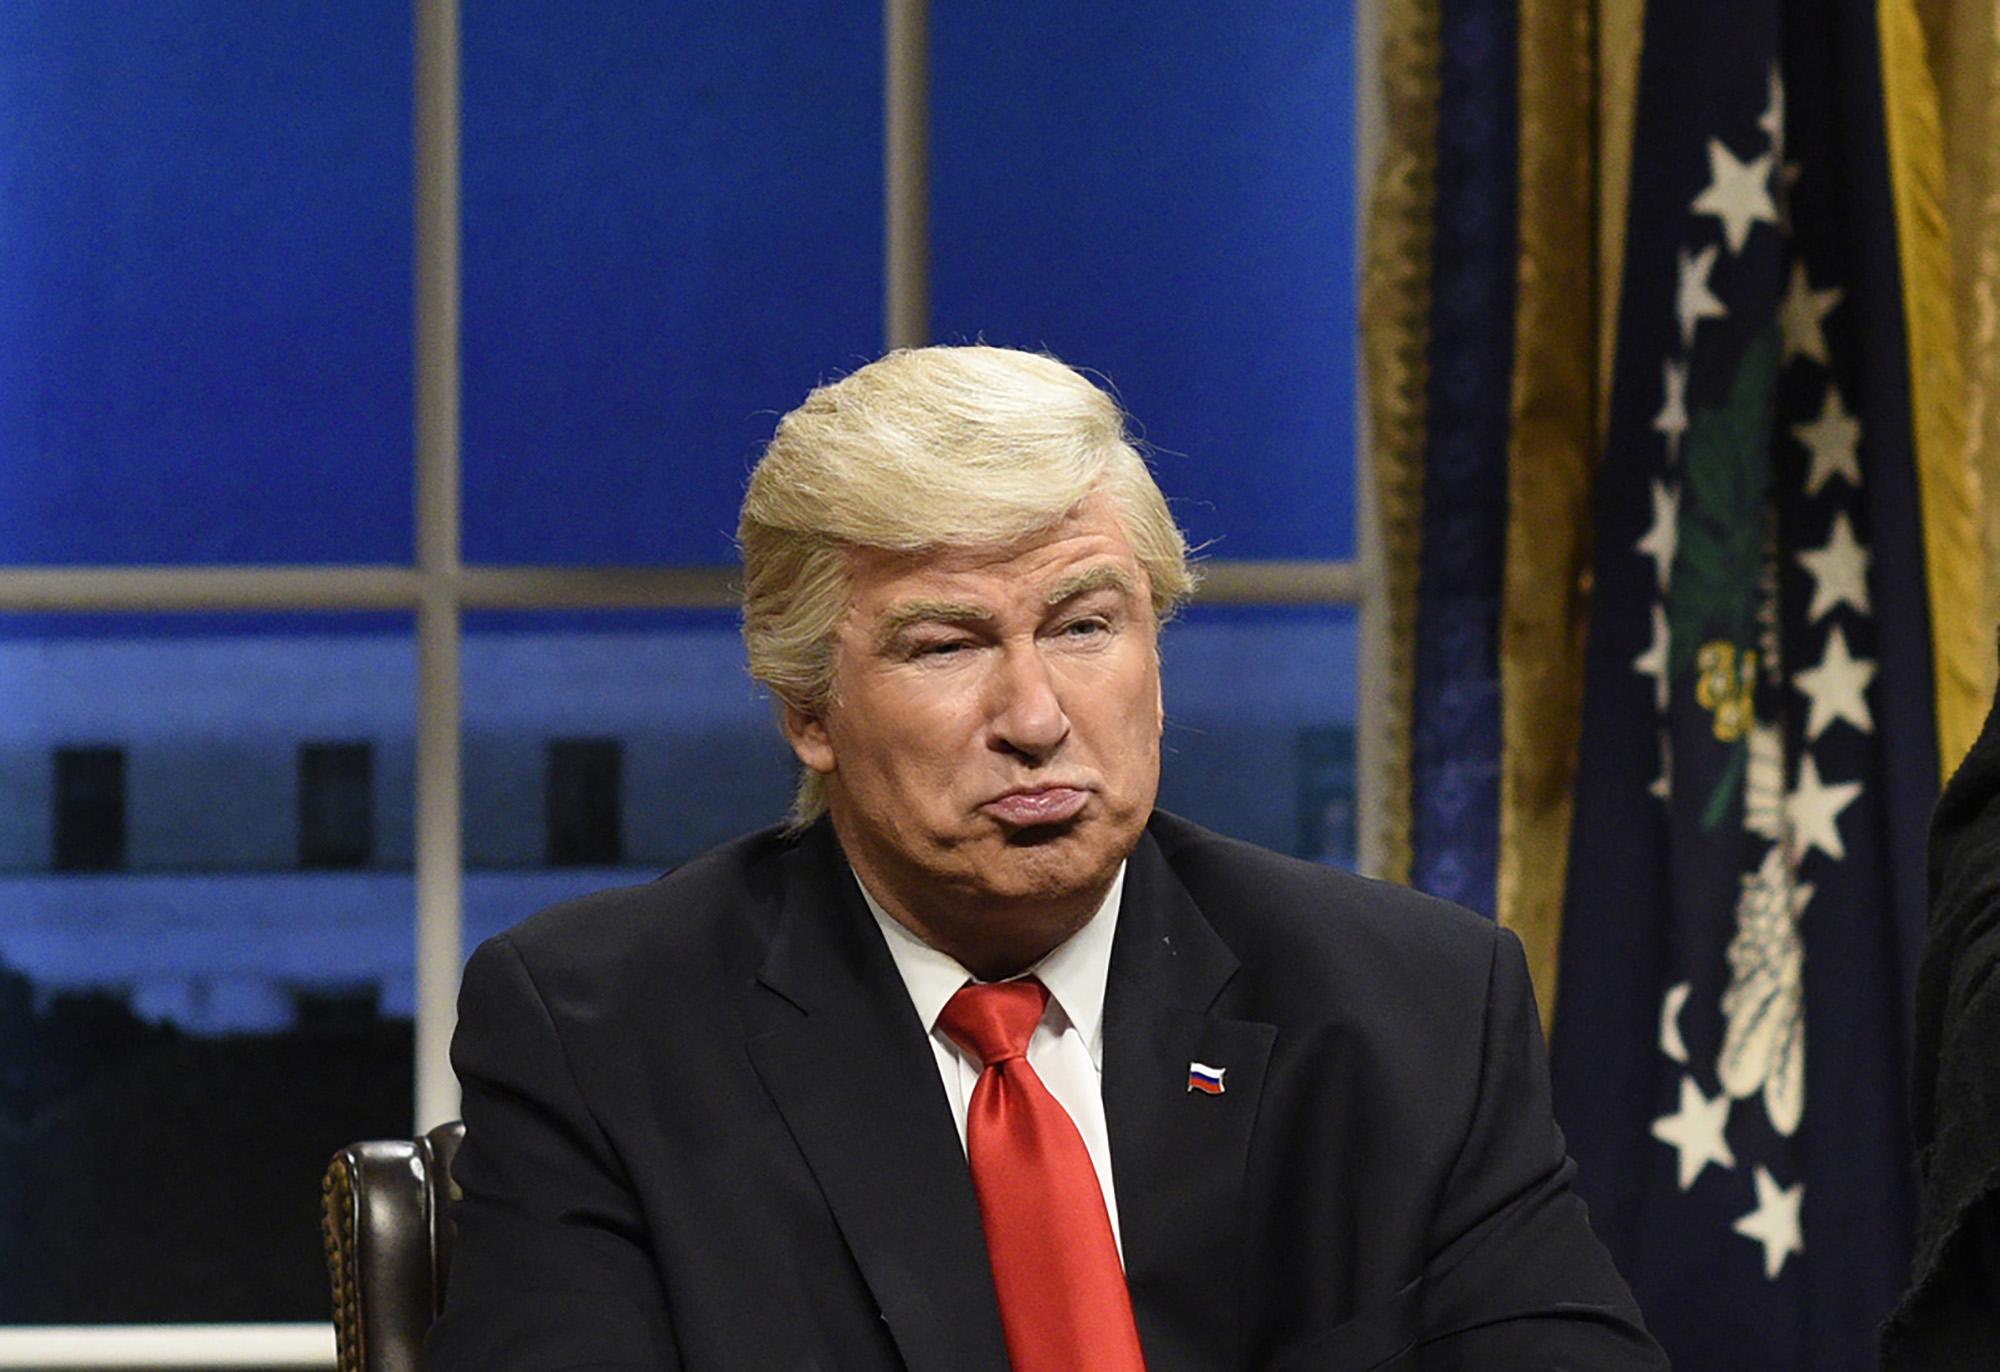 Alec Baldwin as President Donald J. Trump on 'Saturday Night Live' on February 4th, 2017